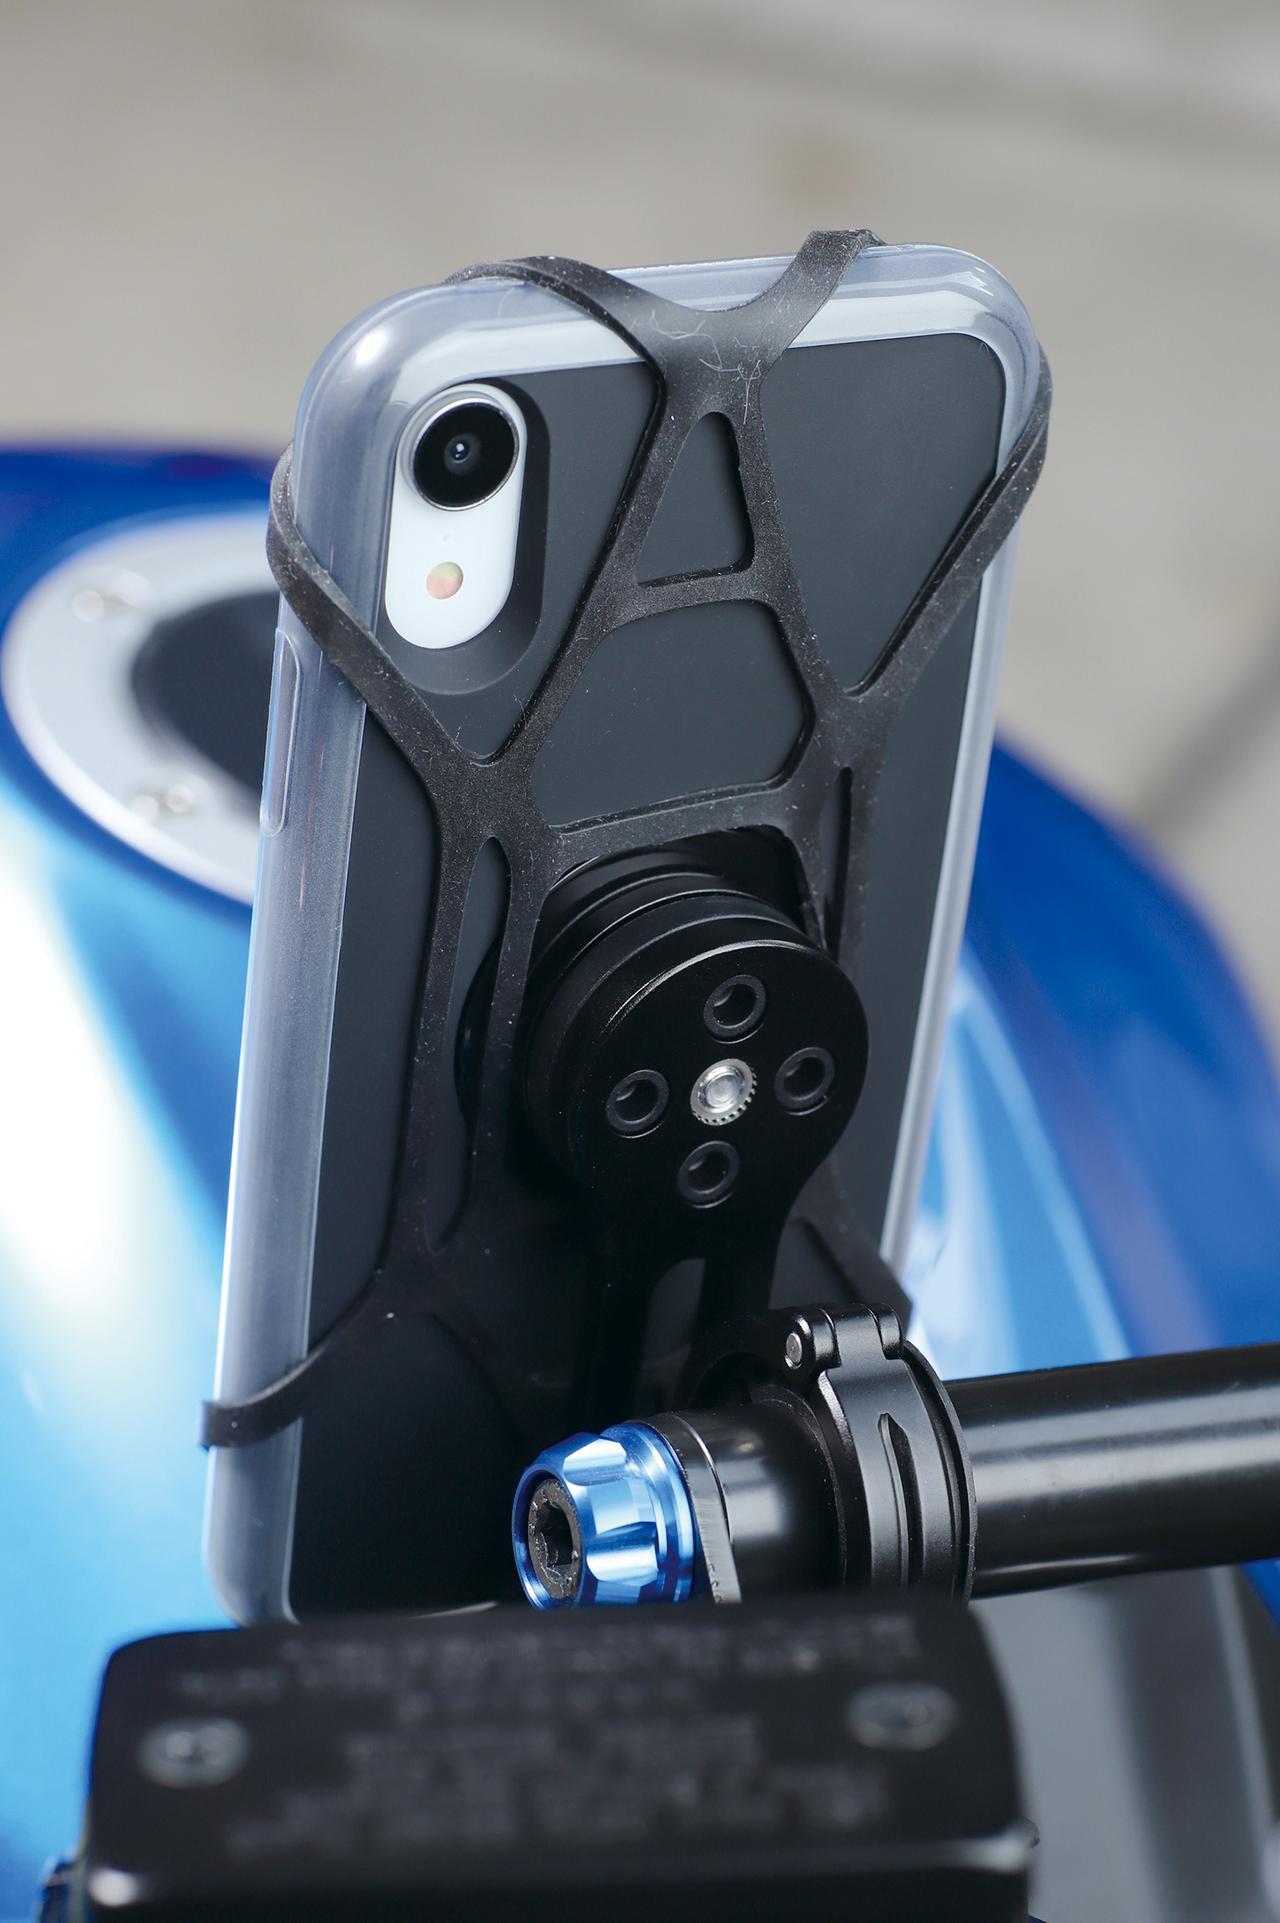 Images : 3番目の画像 - 「ワンタッチ着脱のスタイリッシュなスマホマウント『SP CONNECT MOTO BUNDLE』#GEARSTEST」のアルバム - webオートバイ